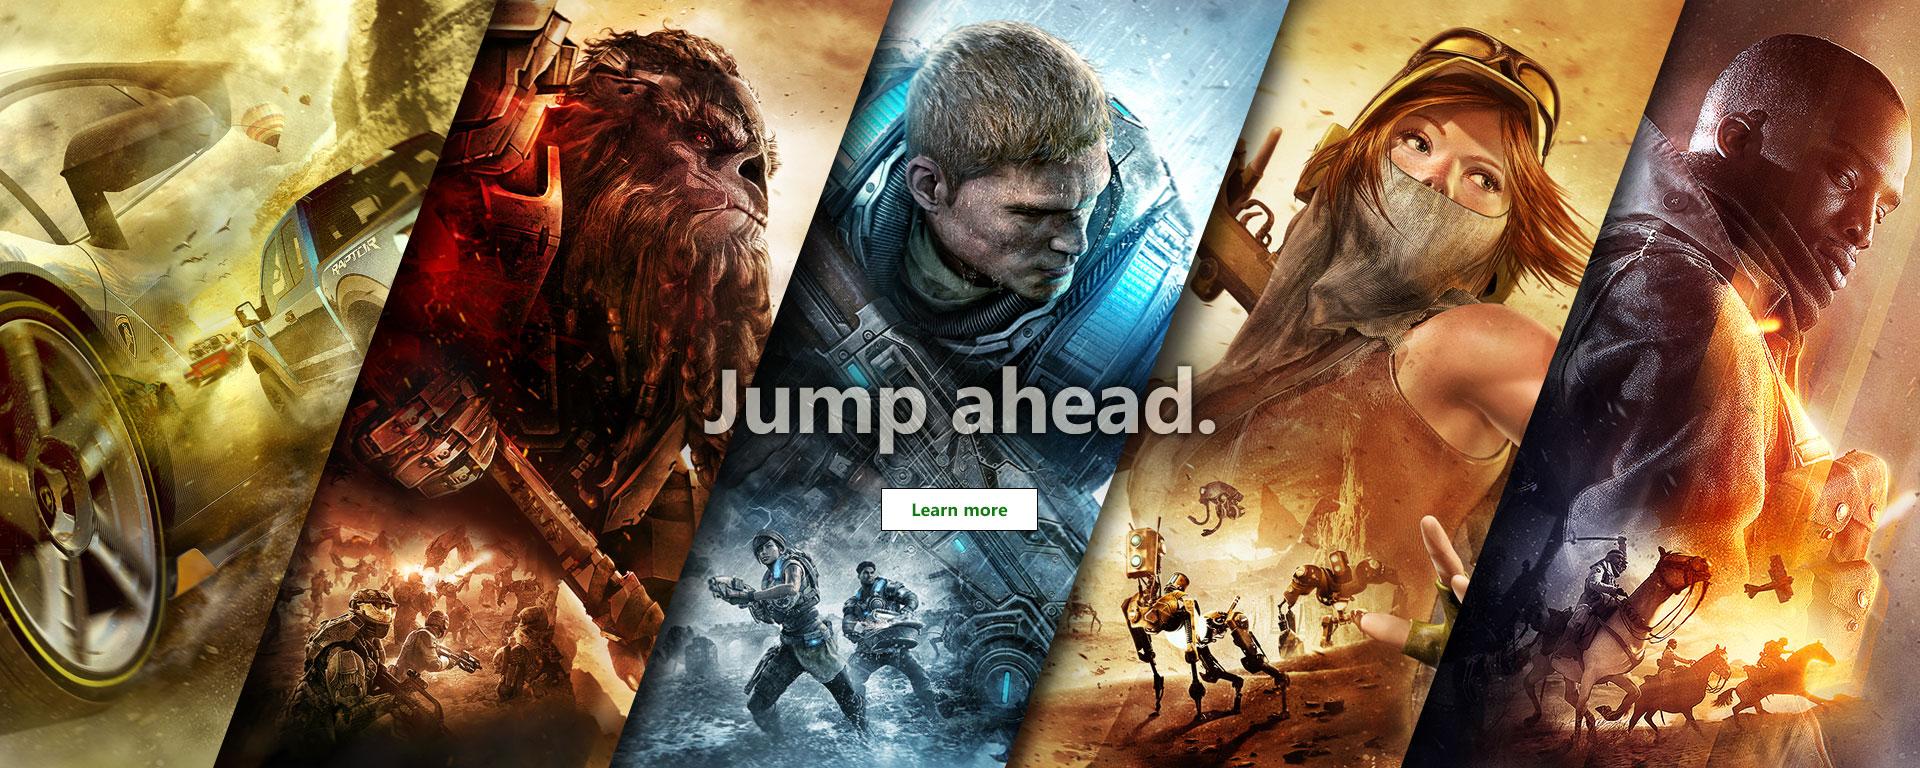 Xbox One Games Xbox